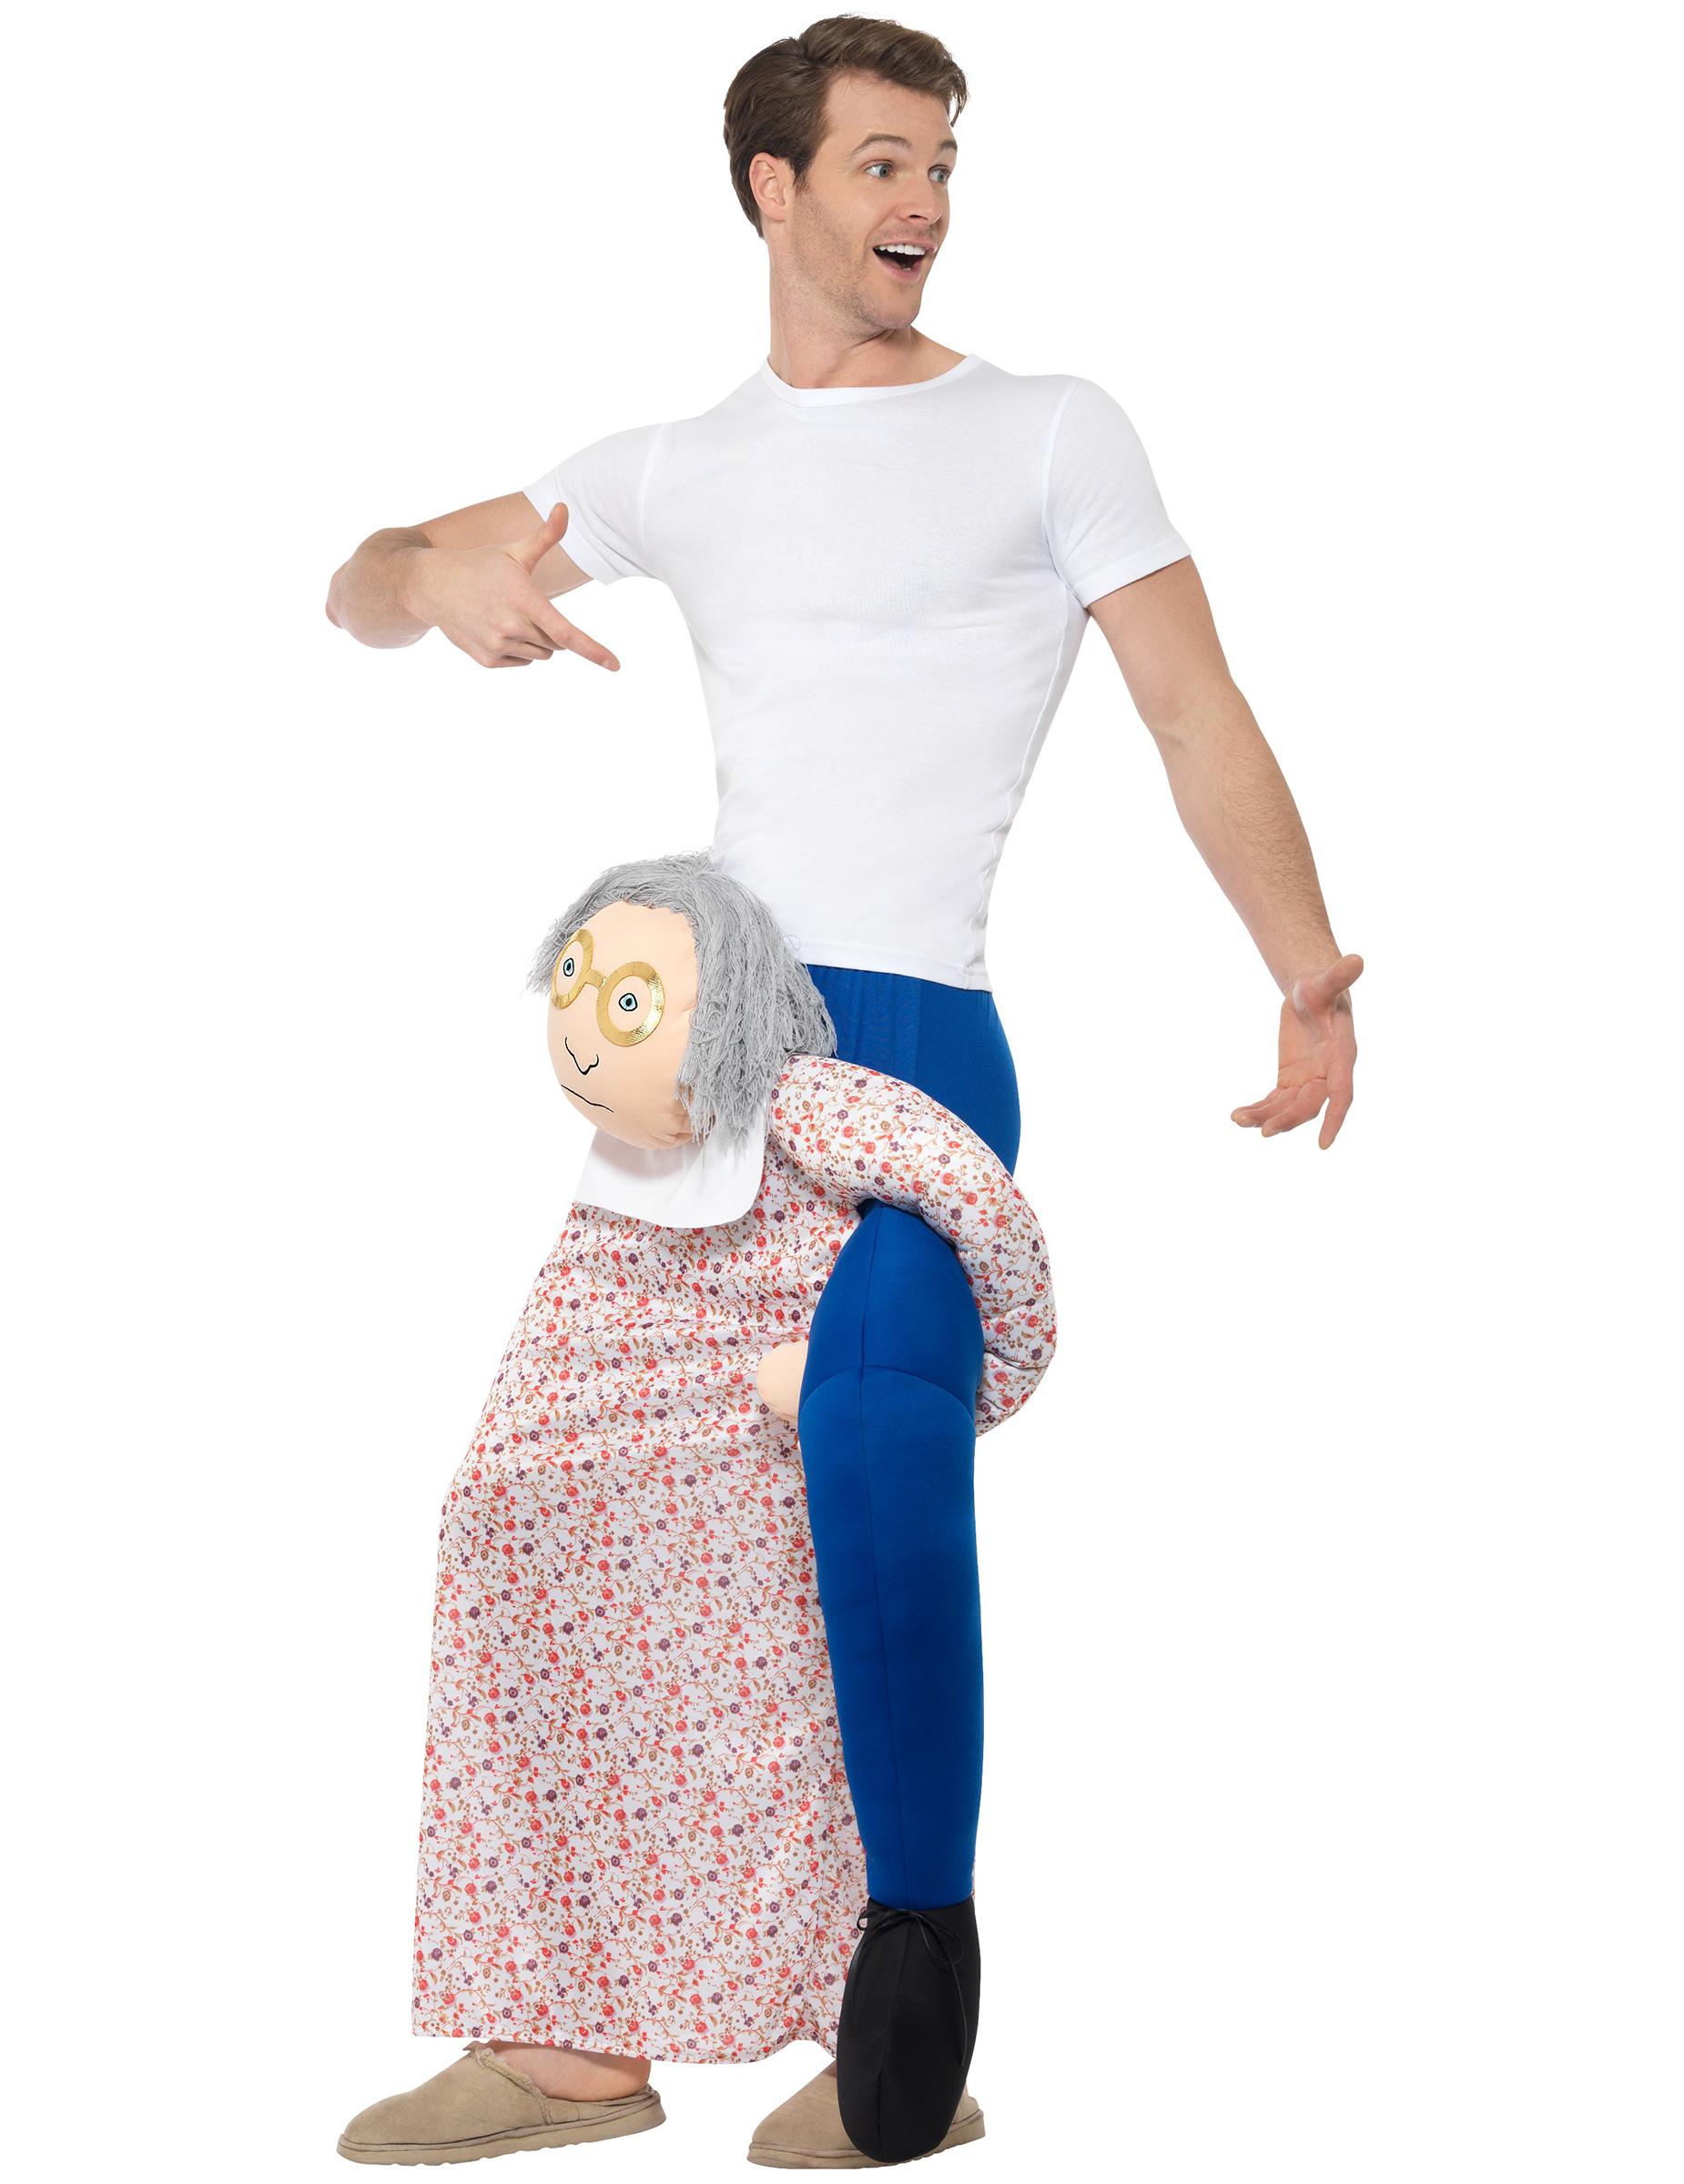 sort bedstemor kønperky tits blowjob